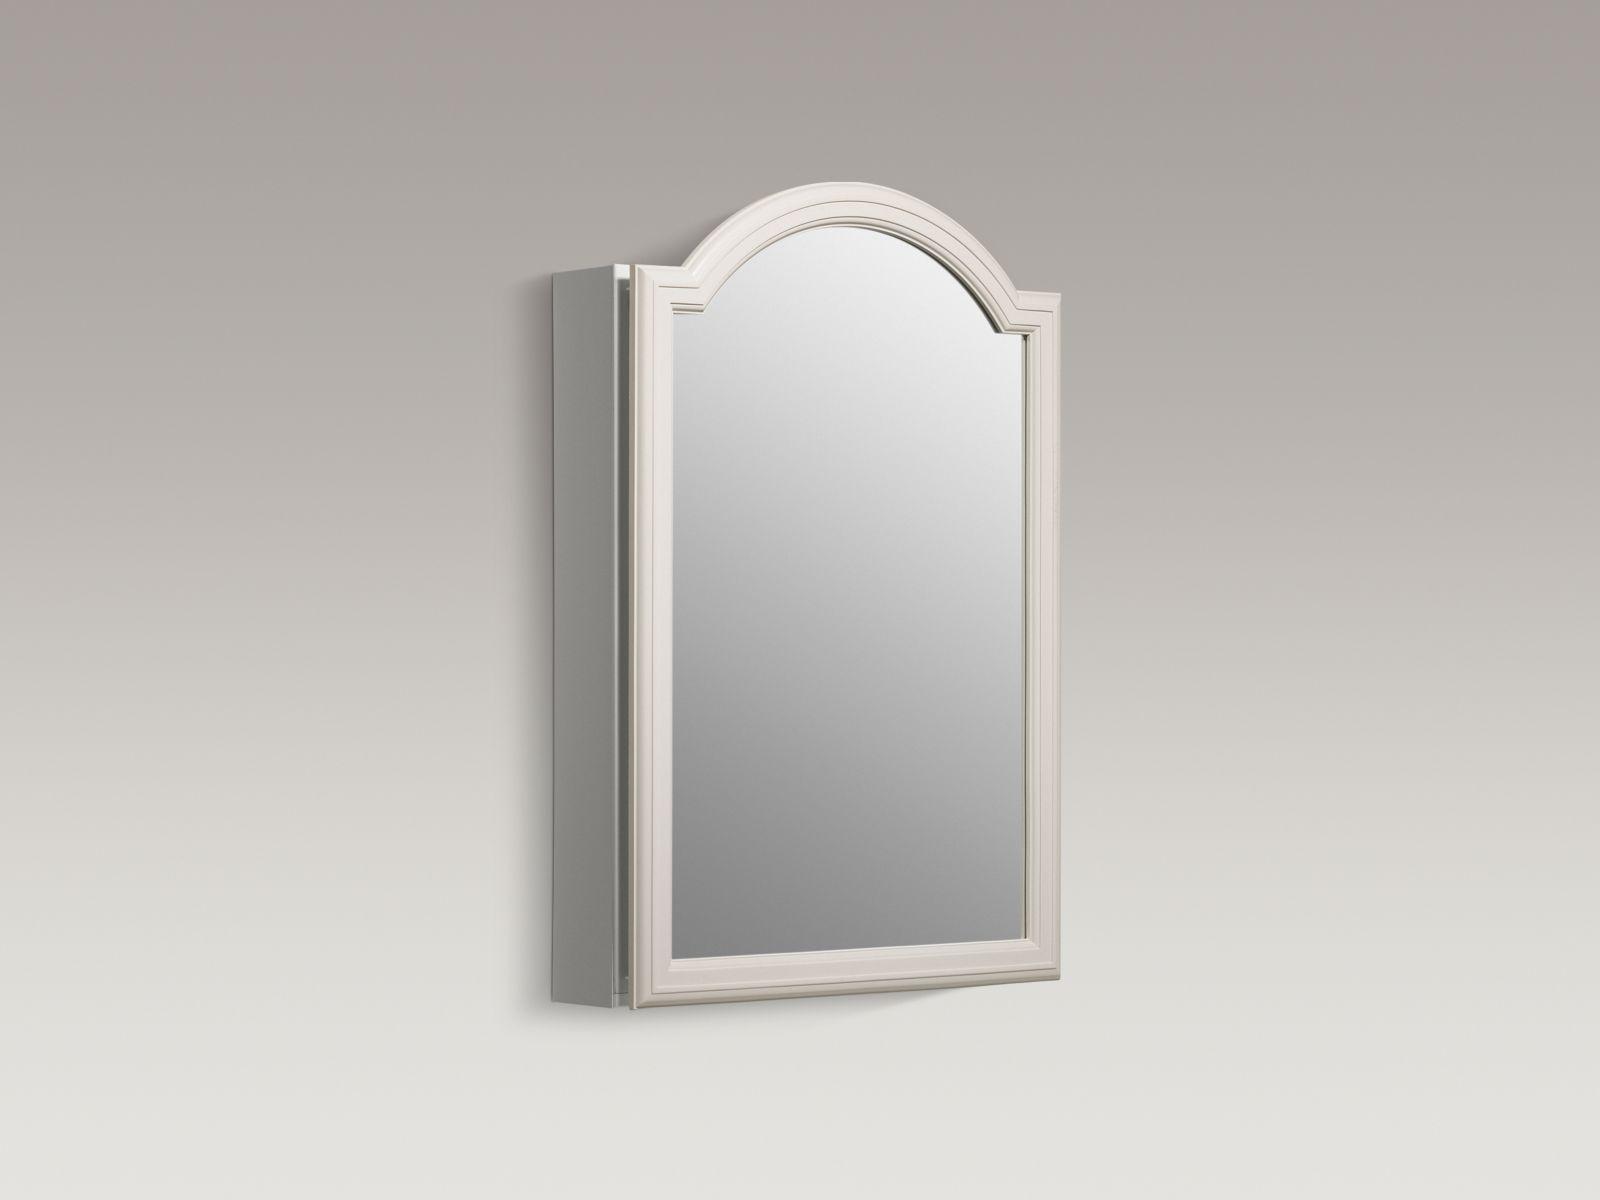 "Kohler K-CB-CLW2030DAW Devonshire 20"" x 30"" White Enameled Aluminum Single-door Medicine Cabinet with Mirror"